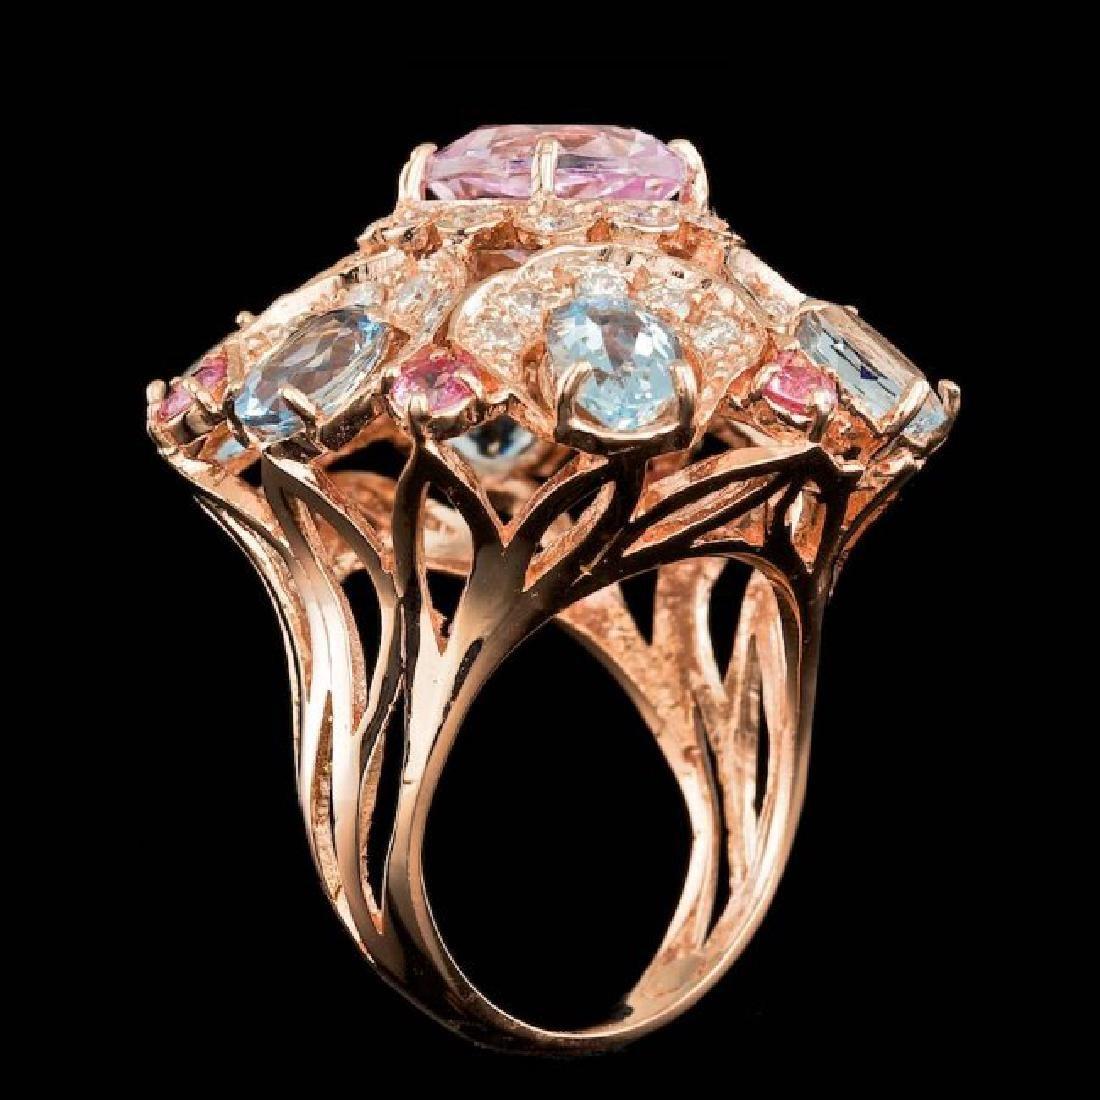 14k Rose Gold 3.50ct Kunzite 1.25ct Diamond Ring - 5